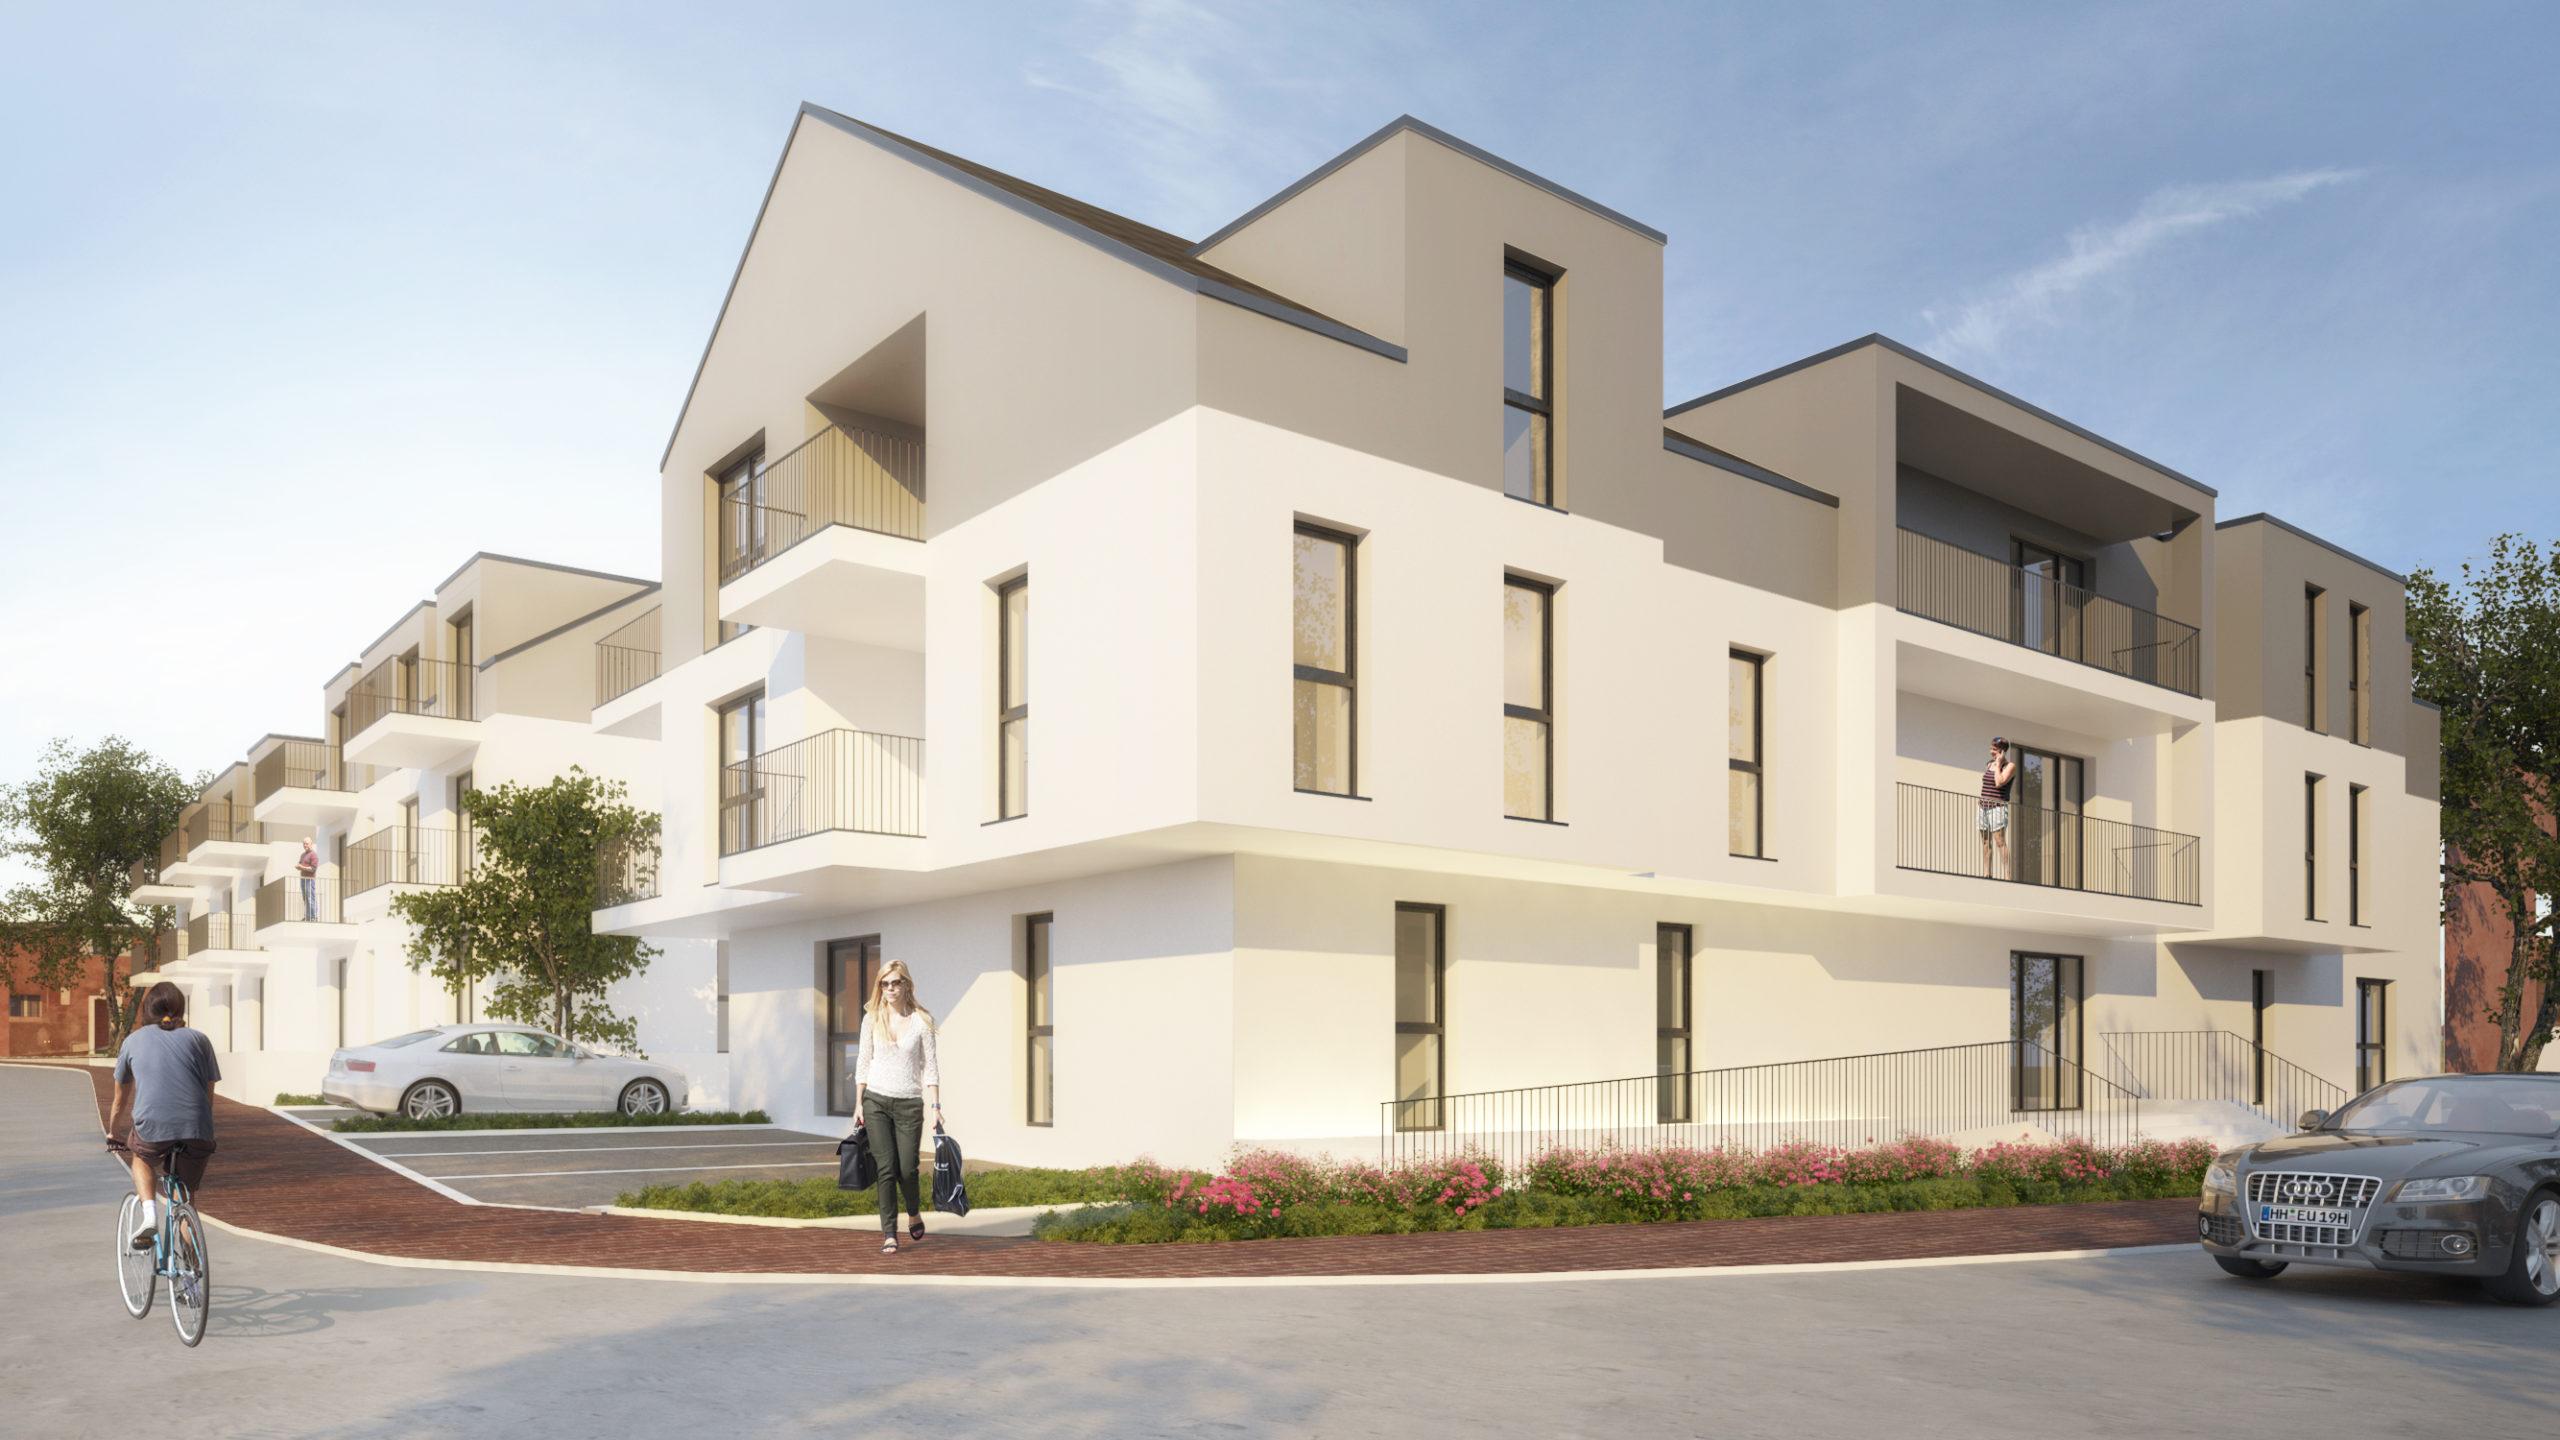 Wohnanlage Gerberweg, Morbach Neubau Visualisierung